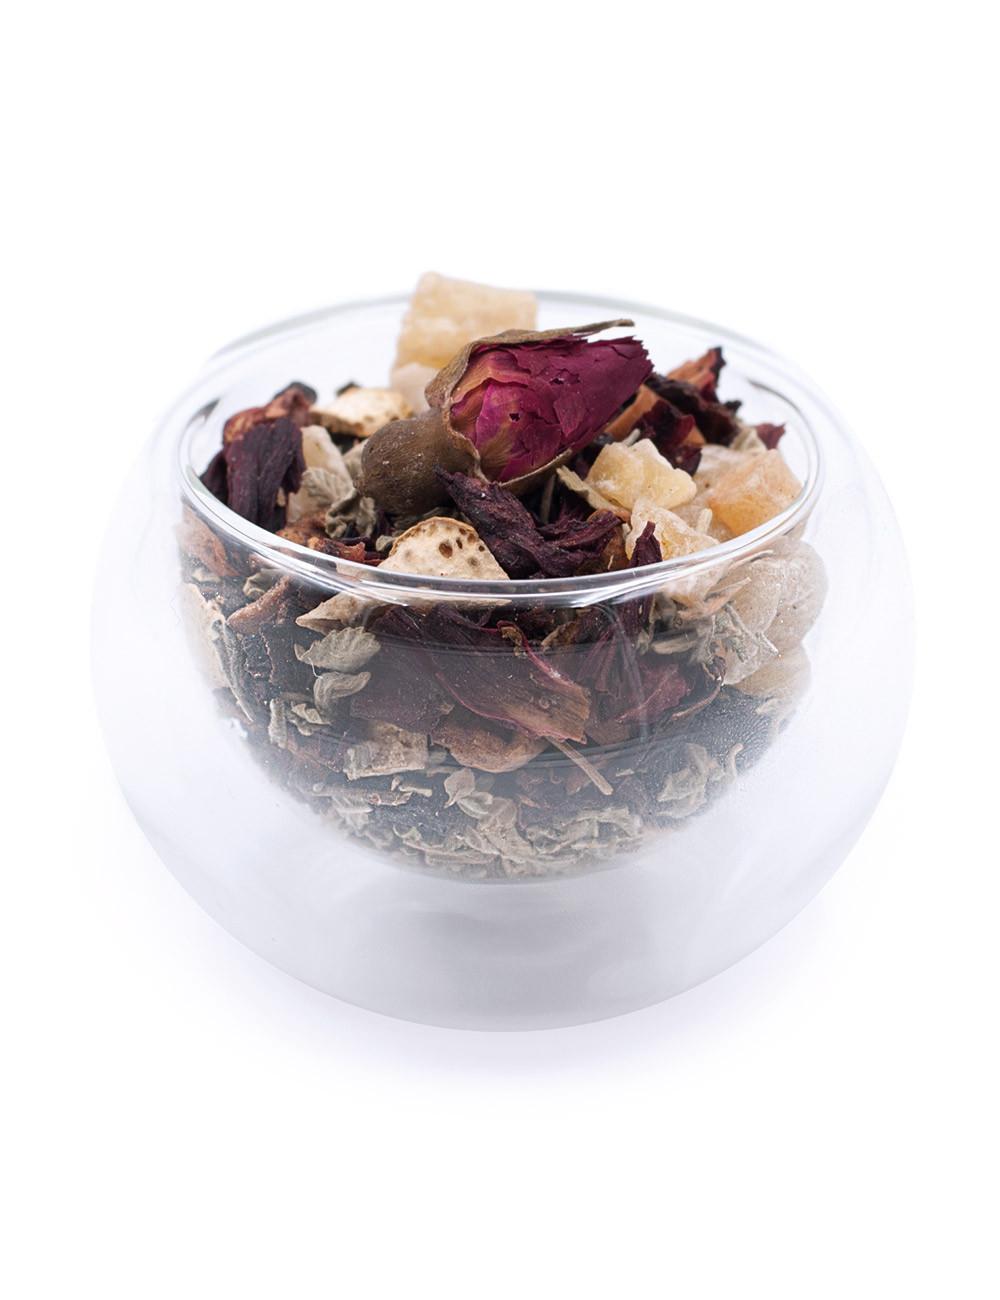 Tisana Damiana, Mango e Uvetta - La Pianta del Tè shop online